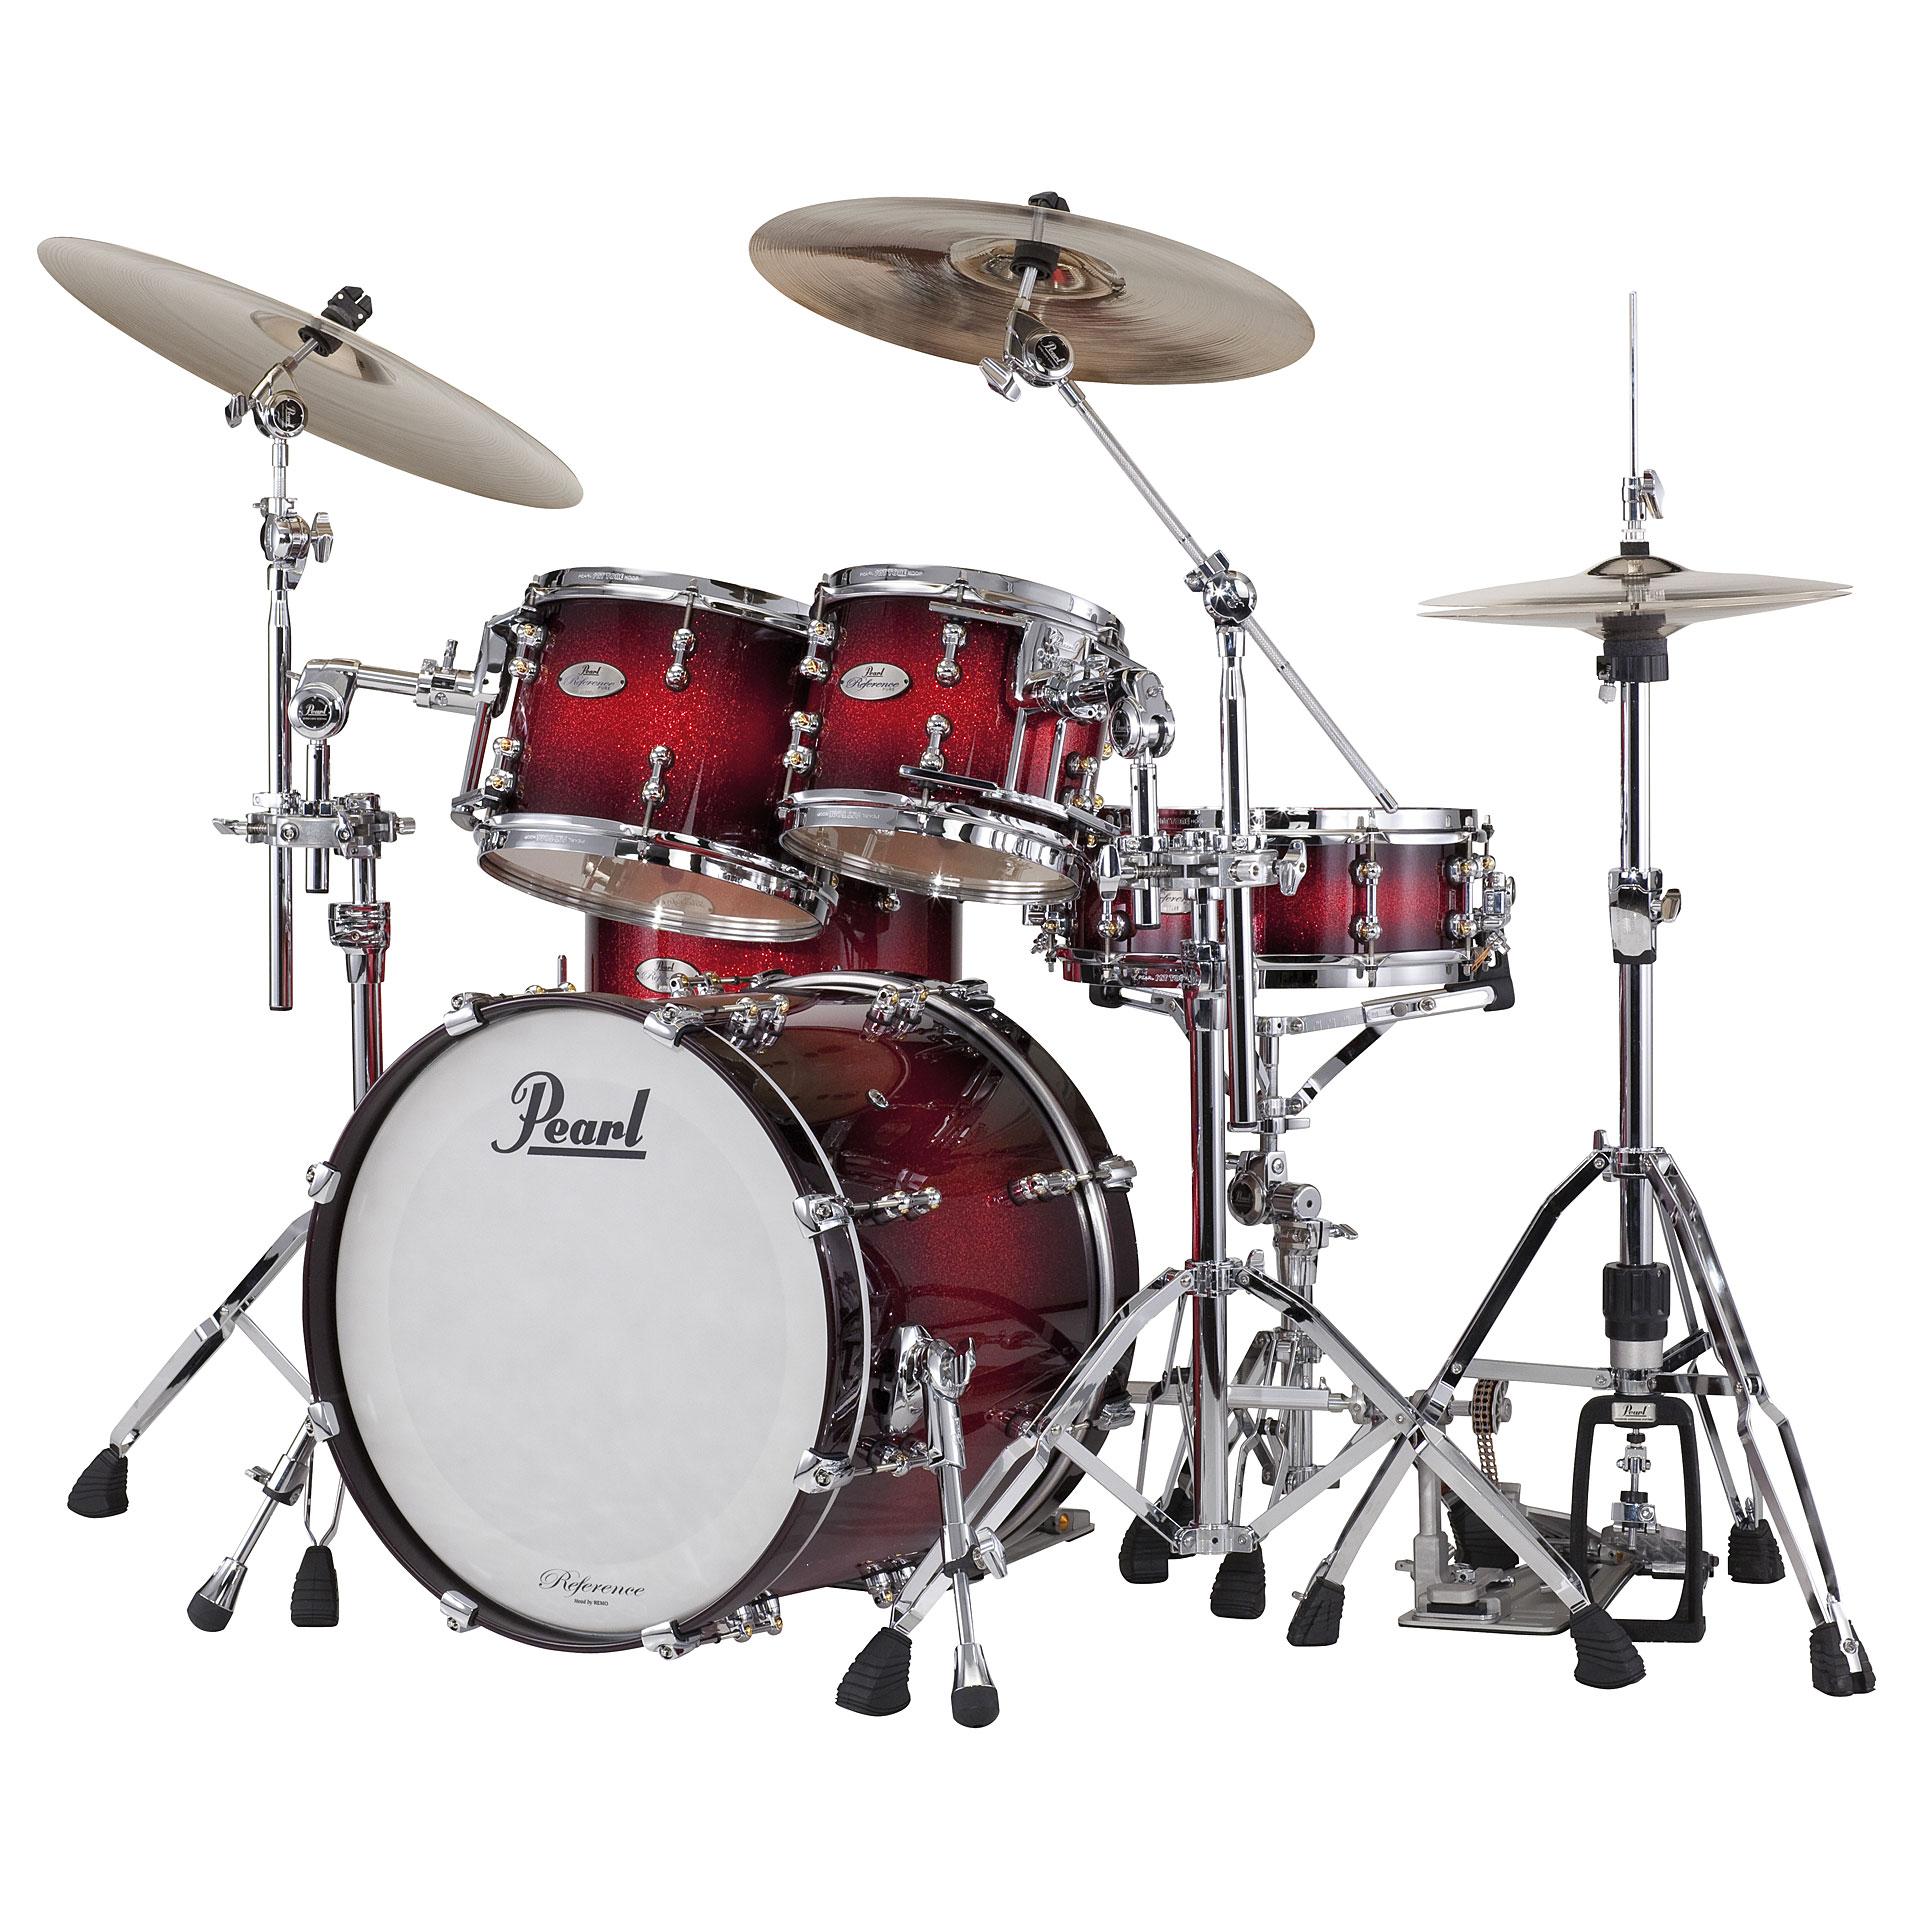 Барабанная установка Pearl Reference pure Full set + Hardware